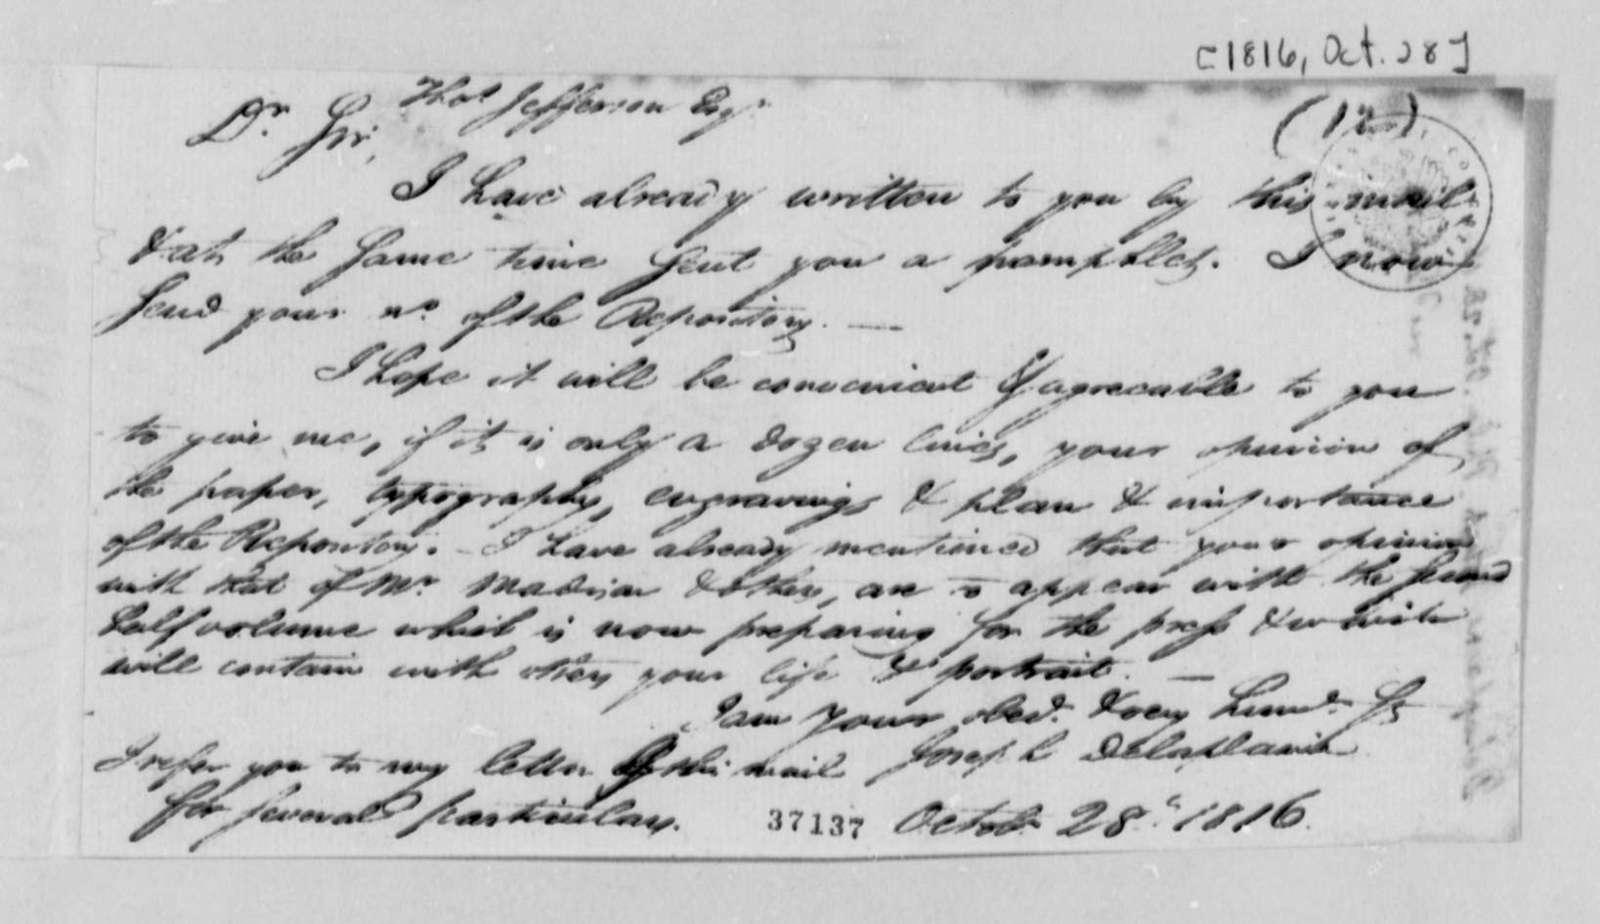 Joseph Delaplaine to Thomas Jefferson, October 28, 1816